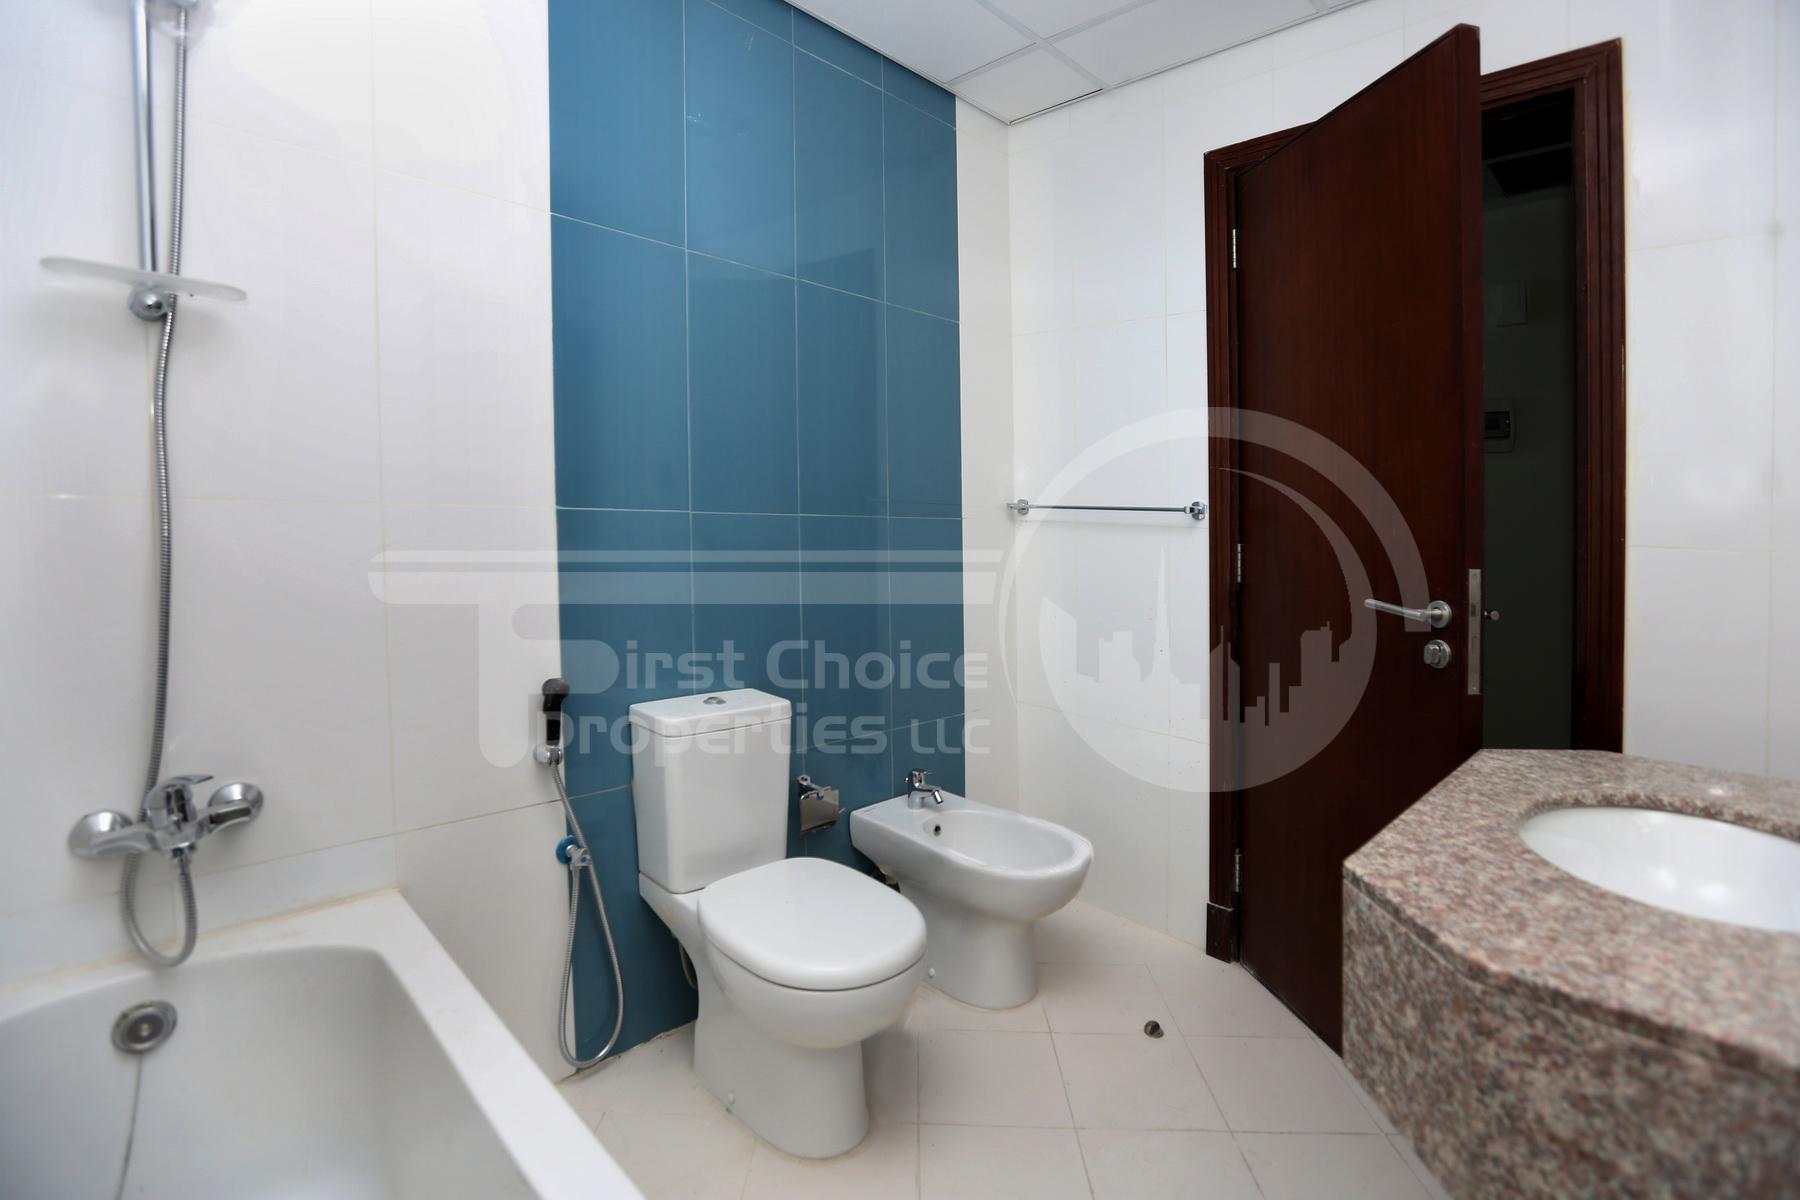 Studio Apartment - Abu Dhabi - UAE - Al Reem Island - Hydra Avenue (3).JPG